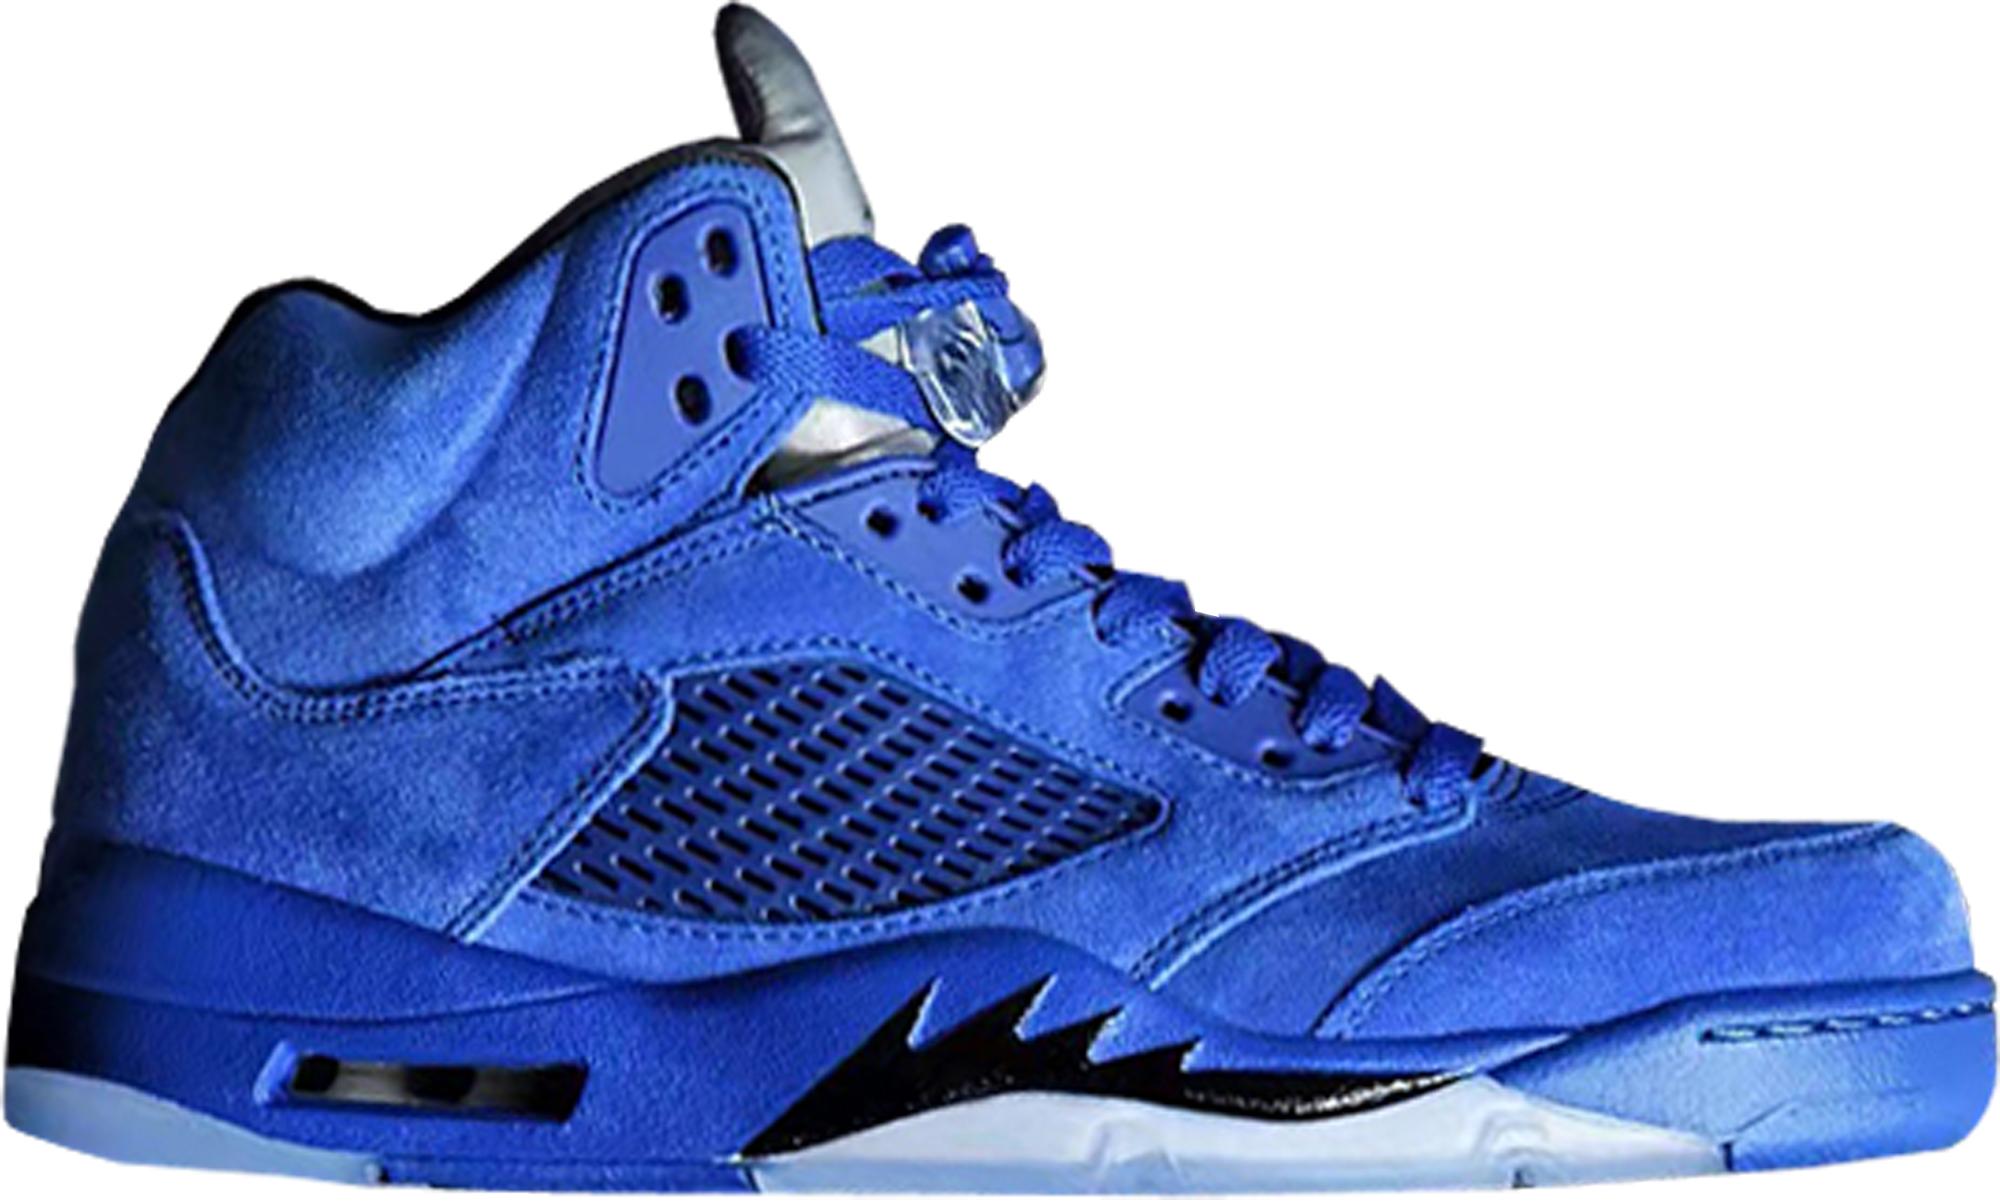 à vendre Footlocker Air Jordan 5 Vue De Dessus En Daim Bleu autorisation de sortie kS7rHmw